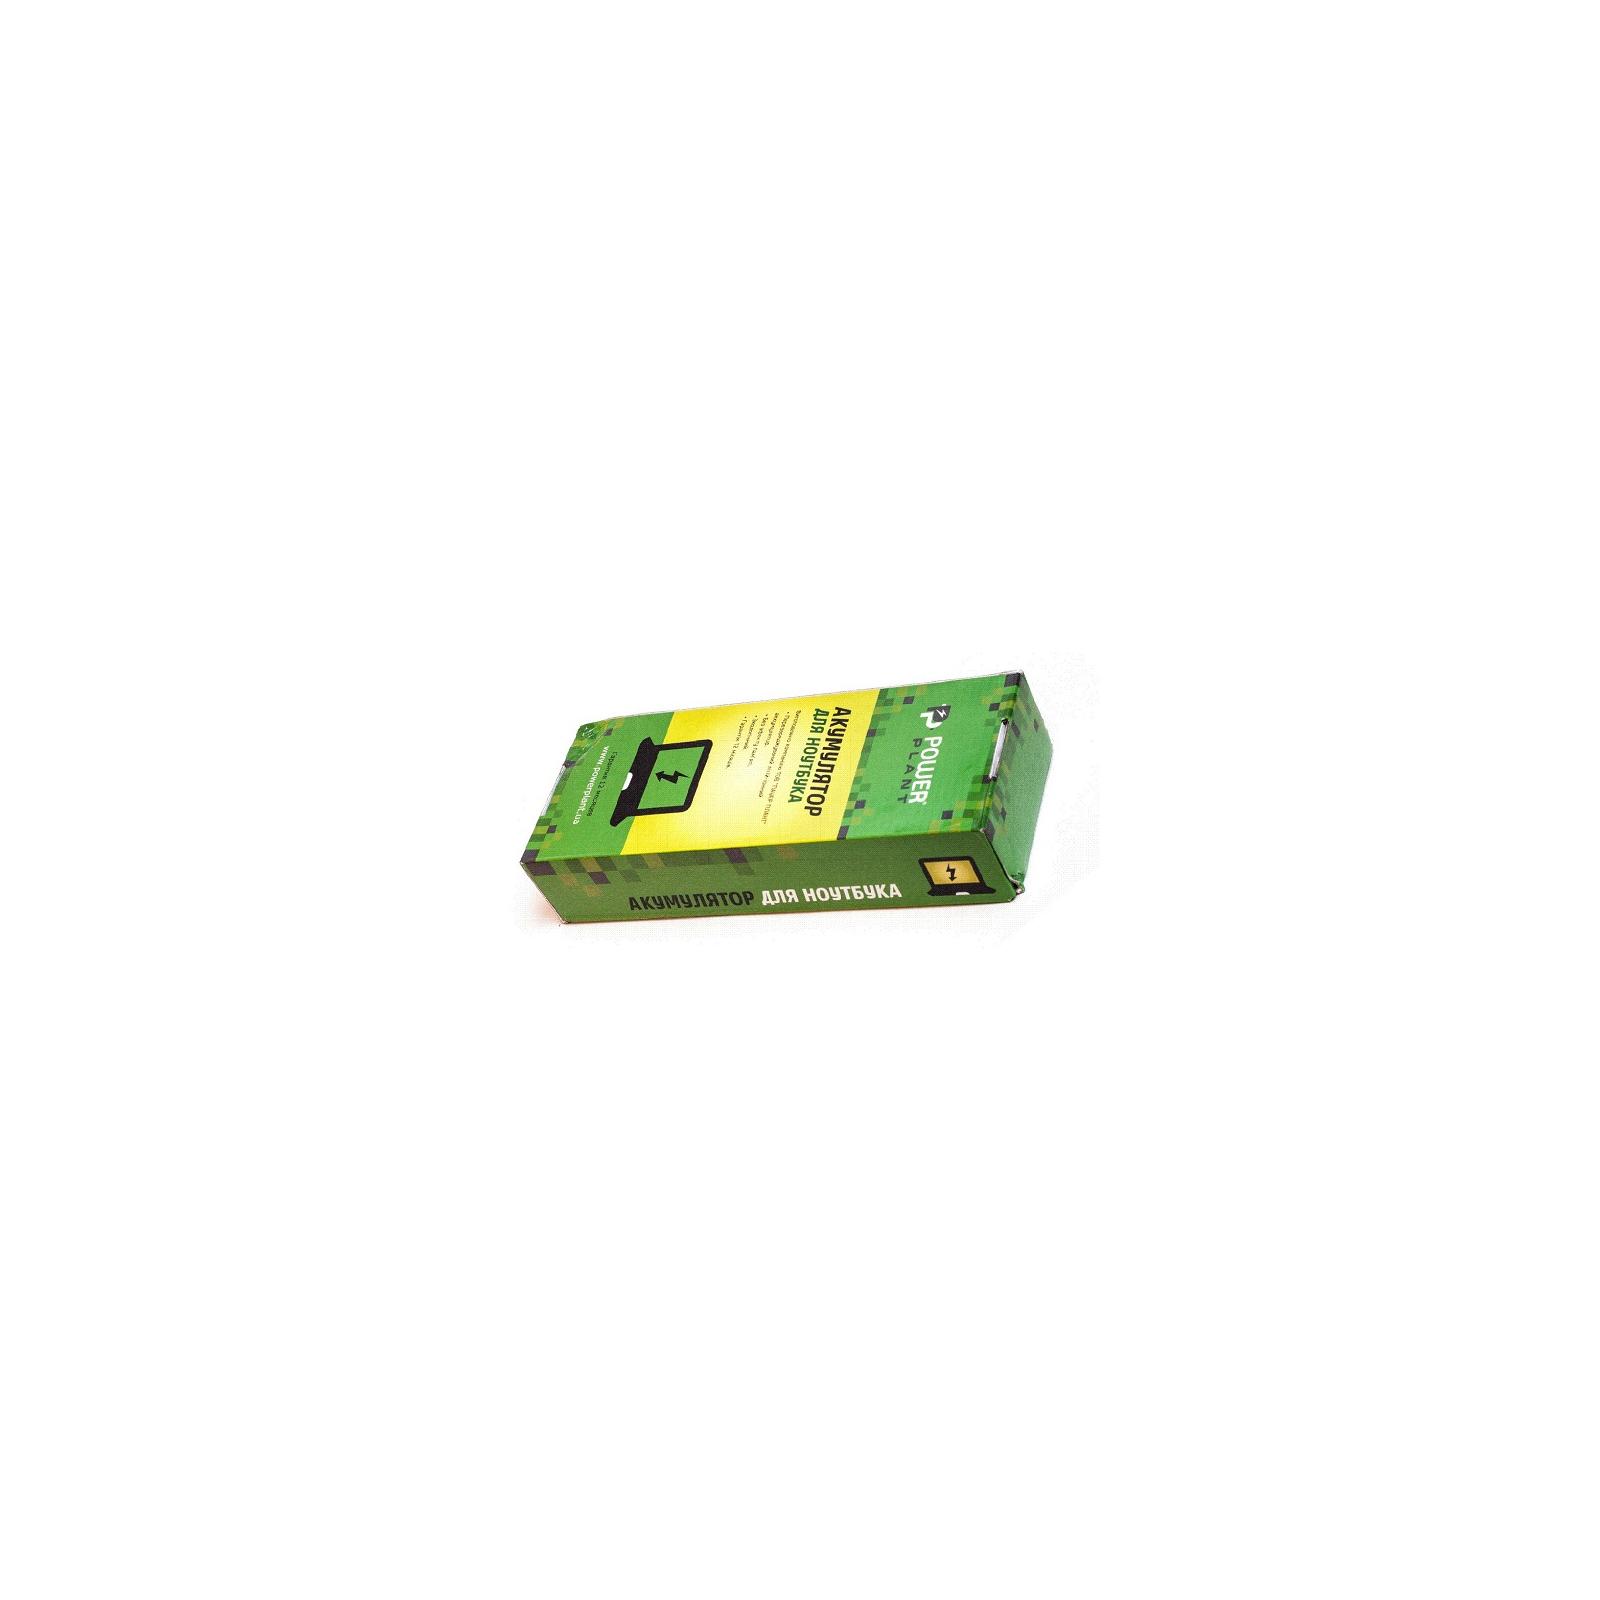 Аккумулятор для ноутбука HP Presario V3000 (HSTNN-DB42, H DV2000 3S2P) 10.8V 5200mAh PowerPlant (NB00000019) изображение 3